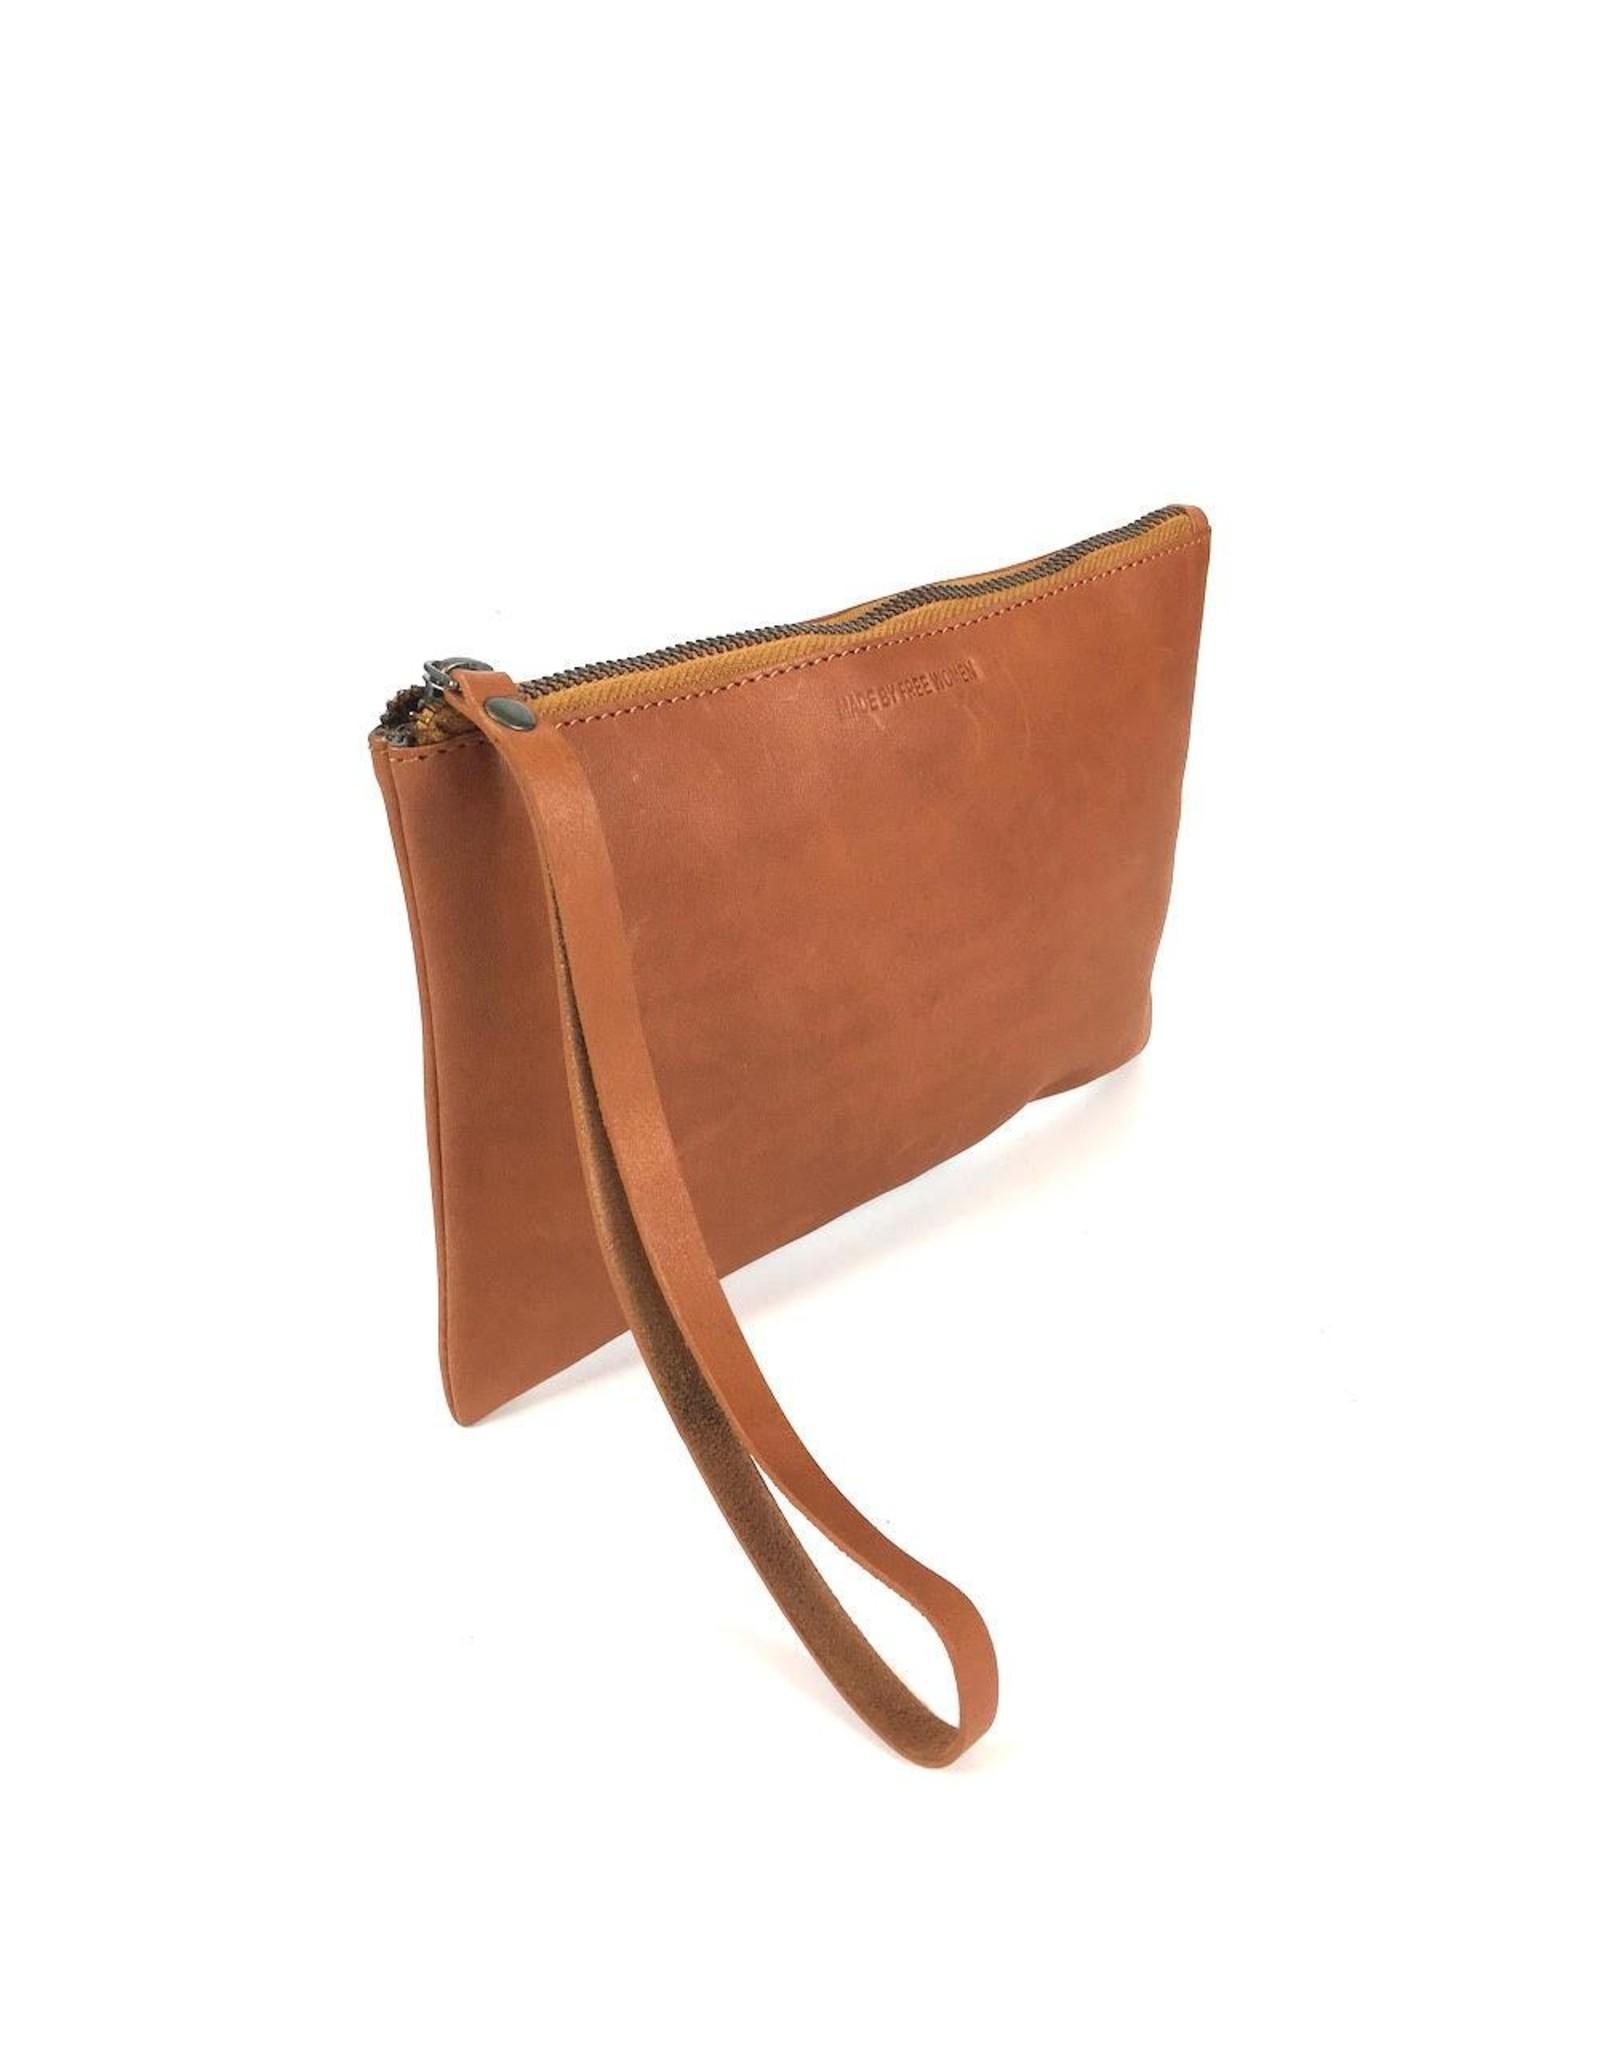 Causegear Leather Clutch